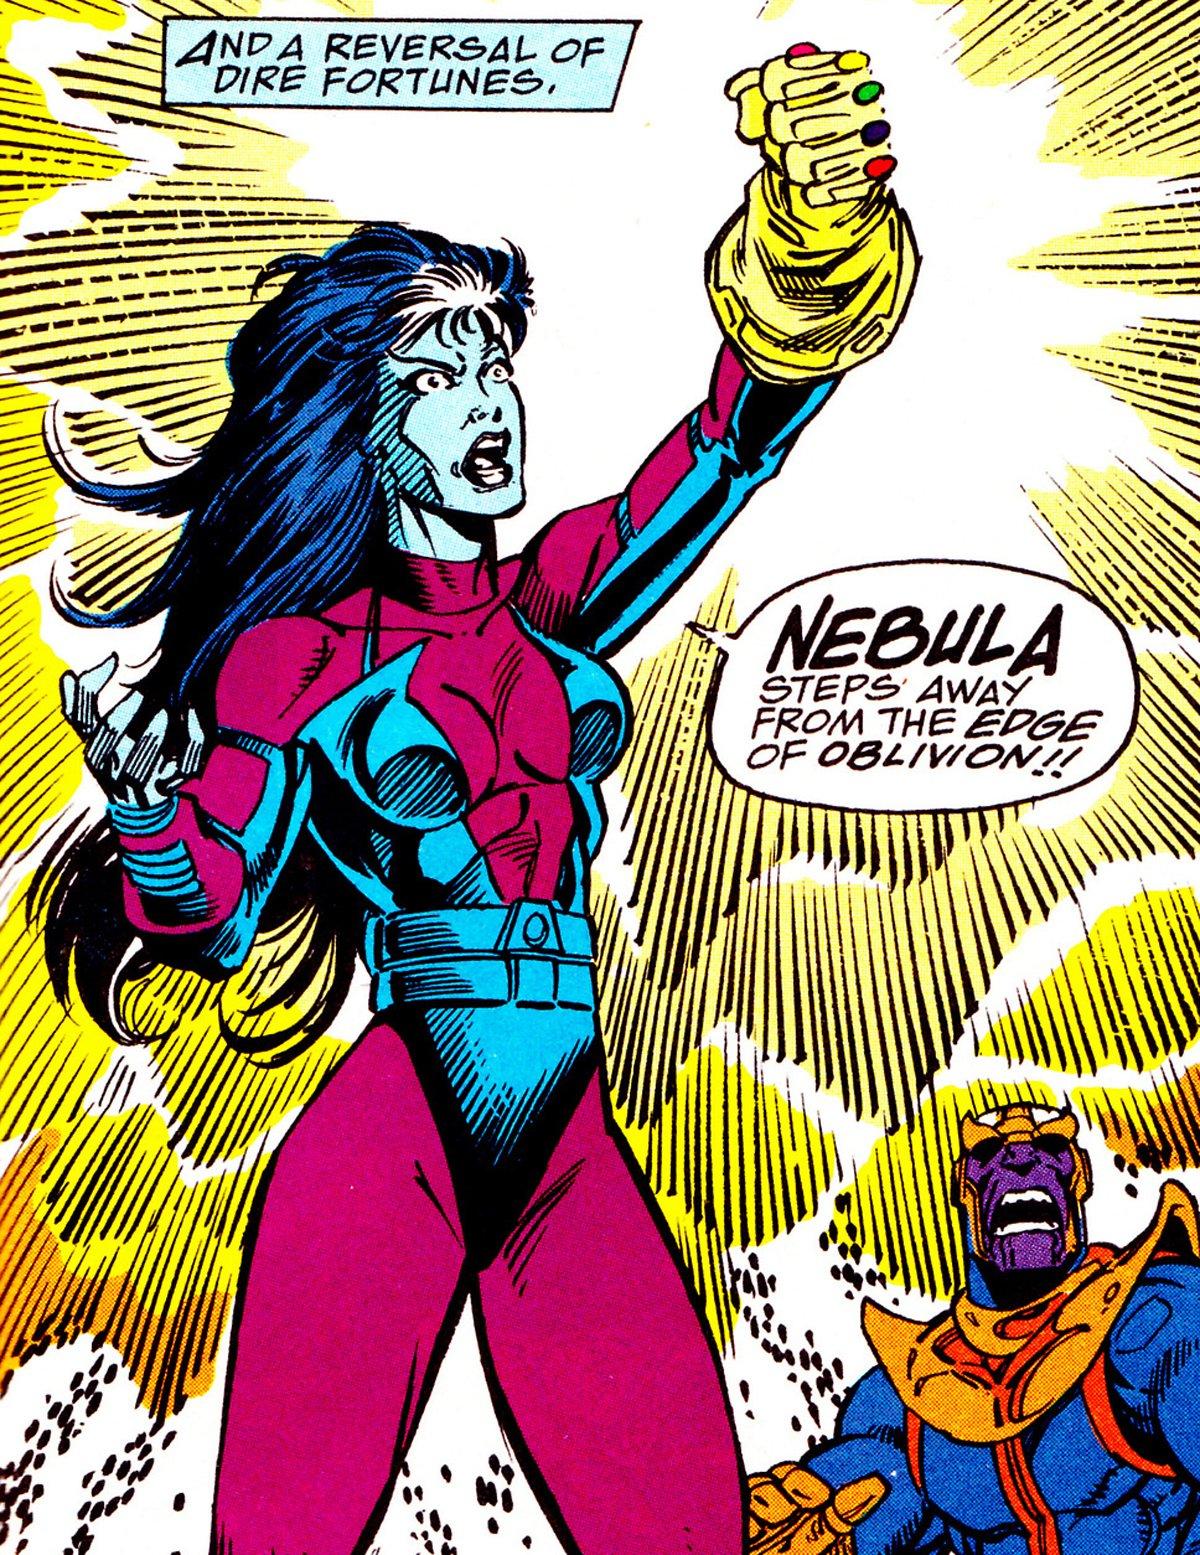 Nebula wears Infinity Gauntlet in Marvel Comics